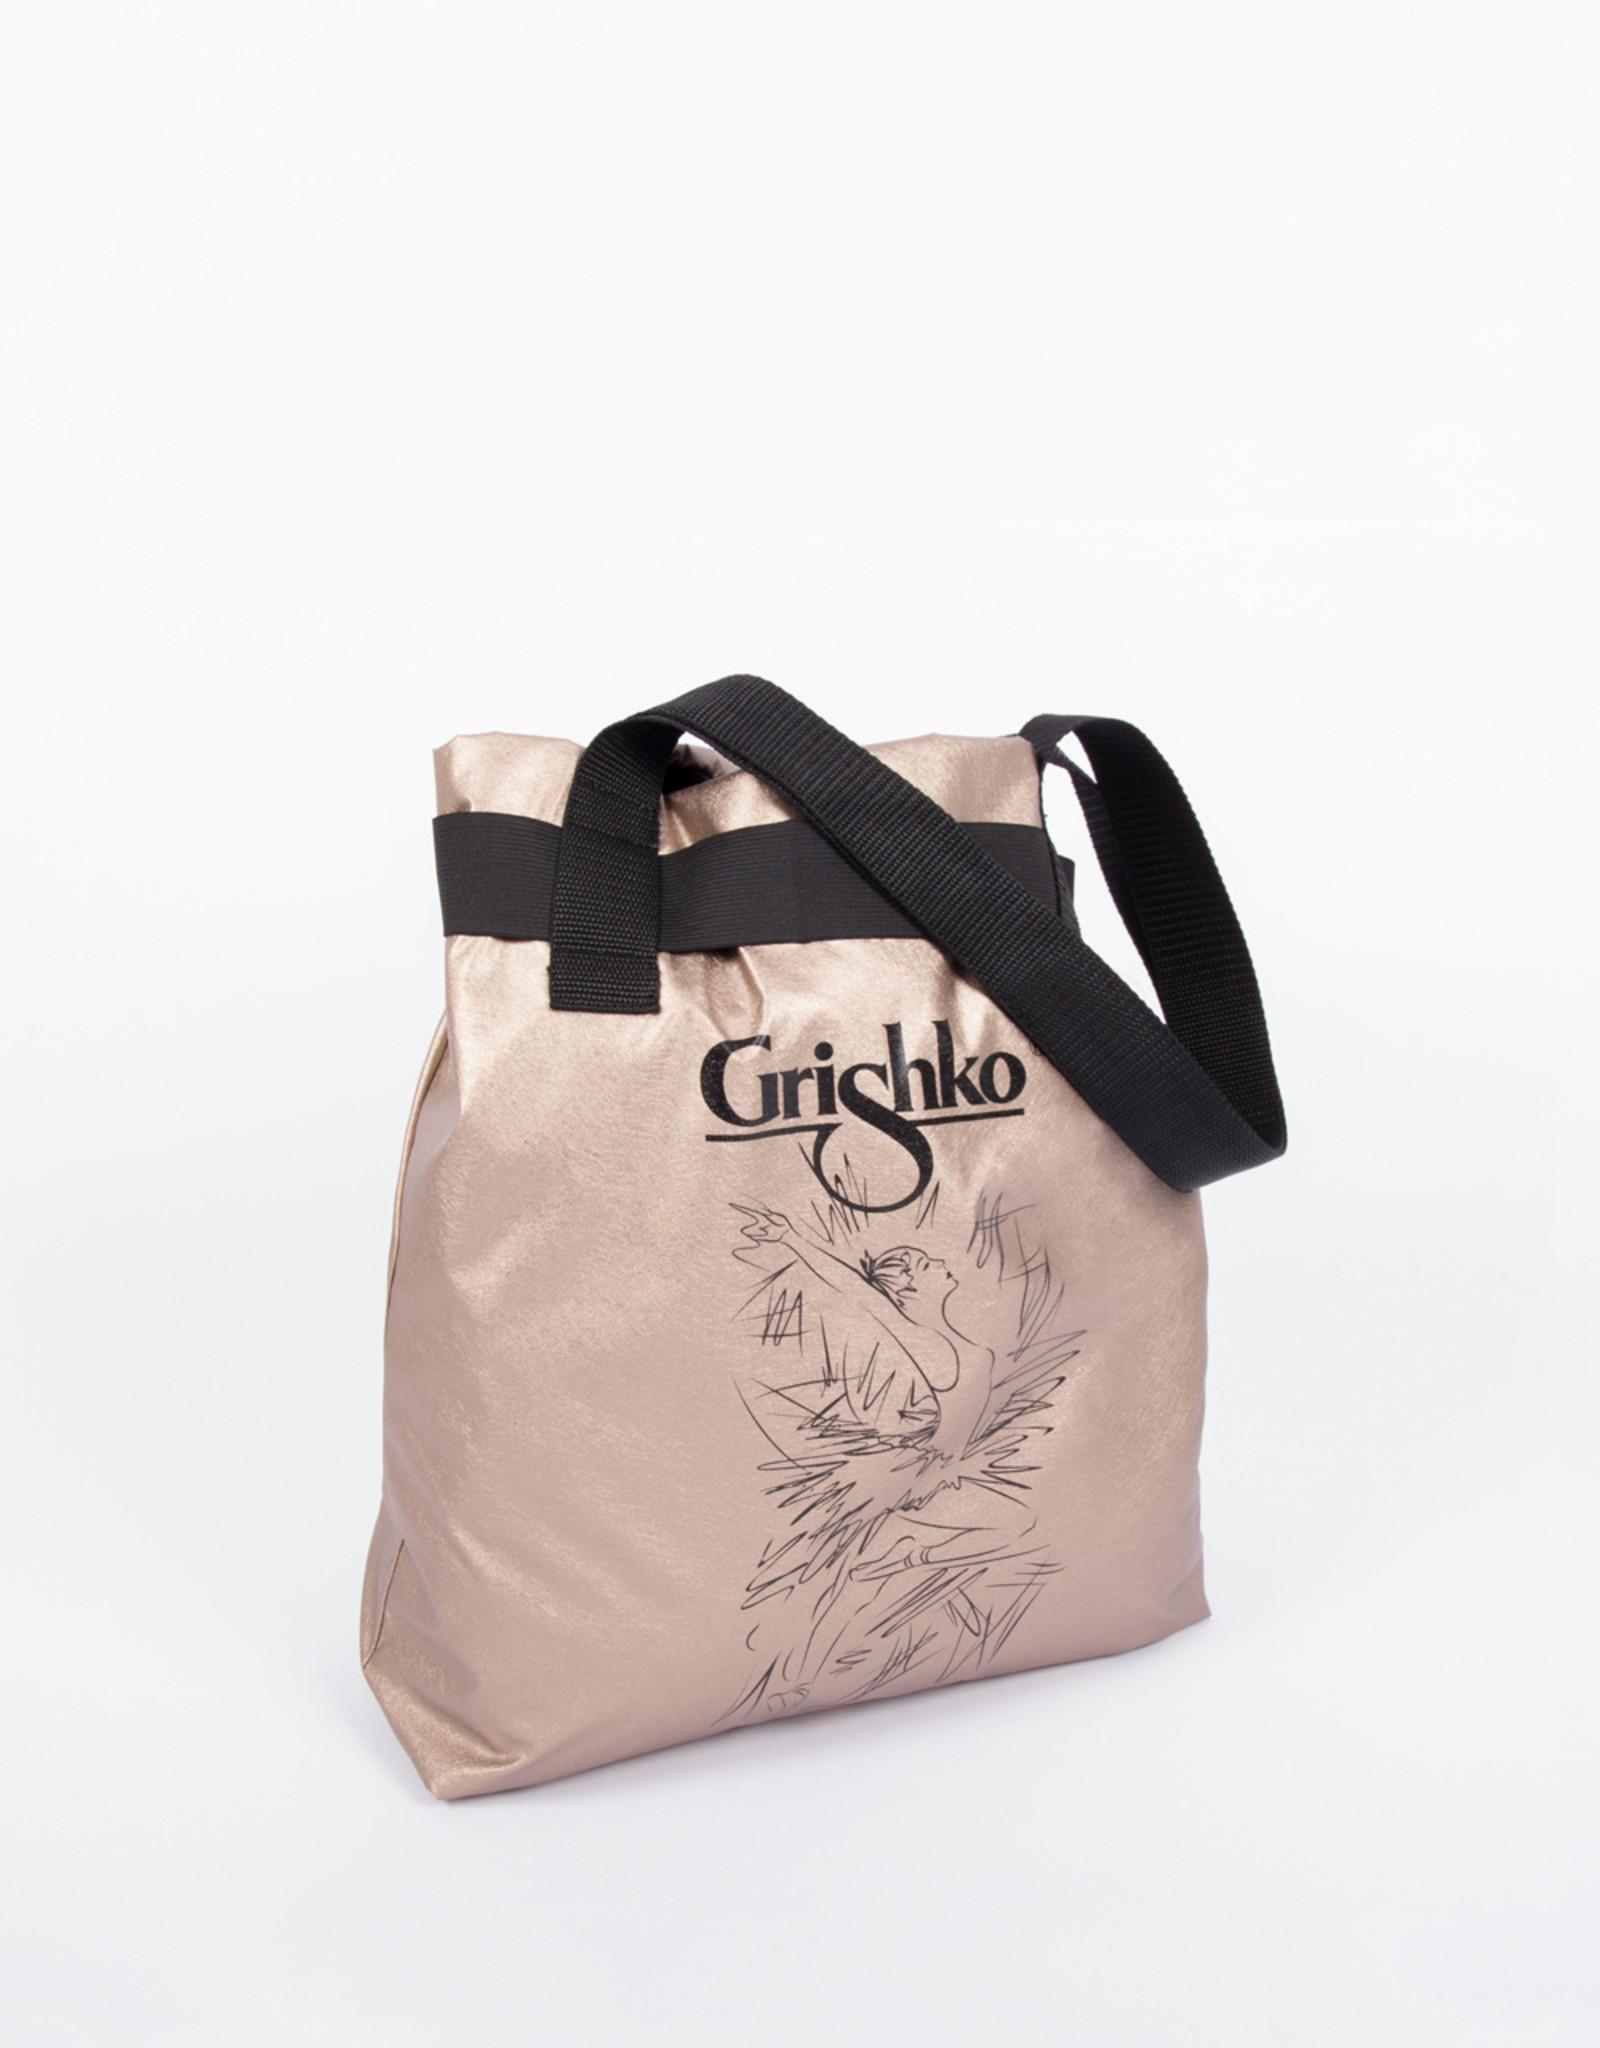 GRISHKO GISELE BAG (5114)